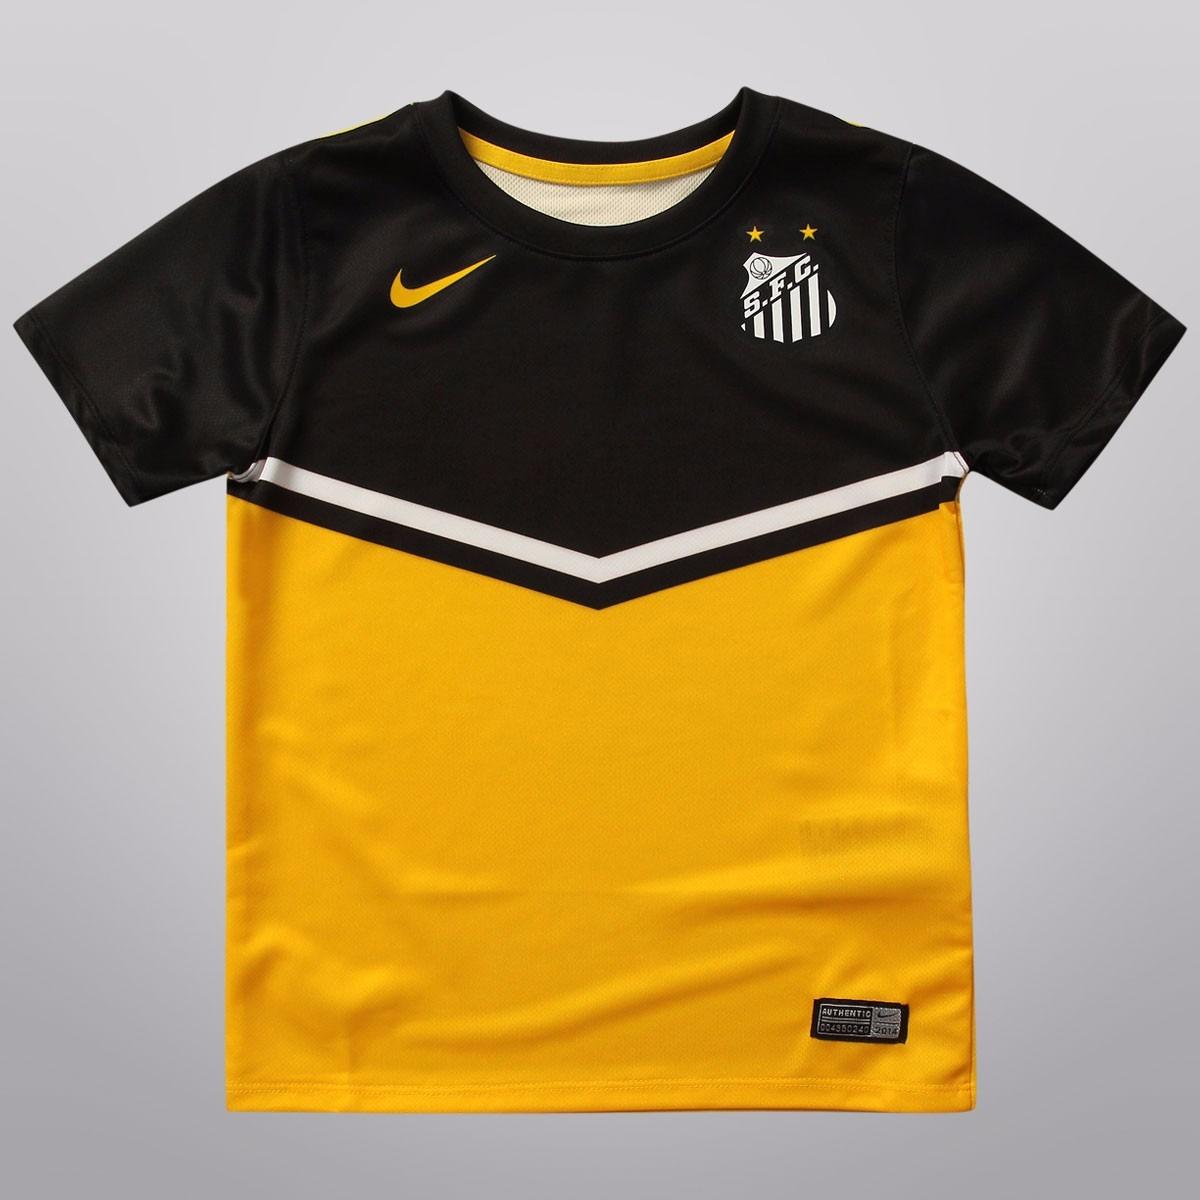 camisa santos feminina nike amarela uniforme ill. Carregando zoom. 2905275932461